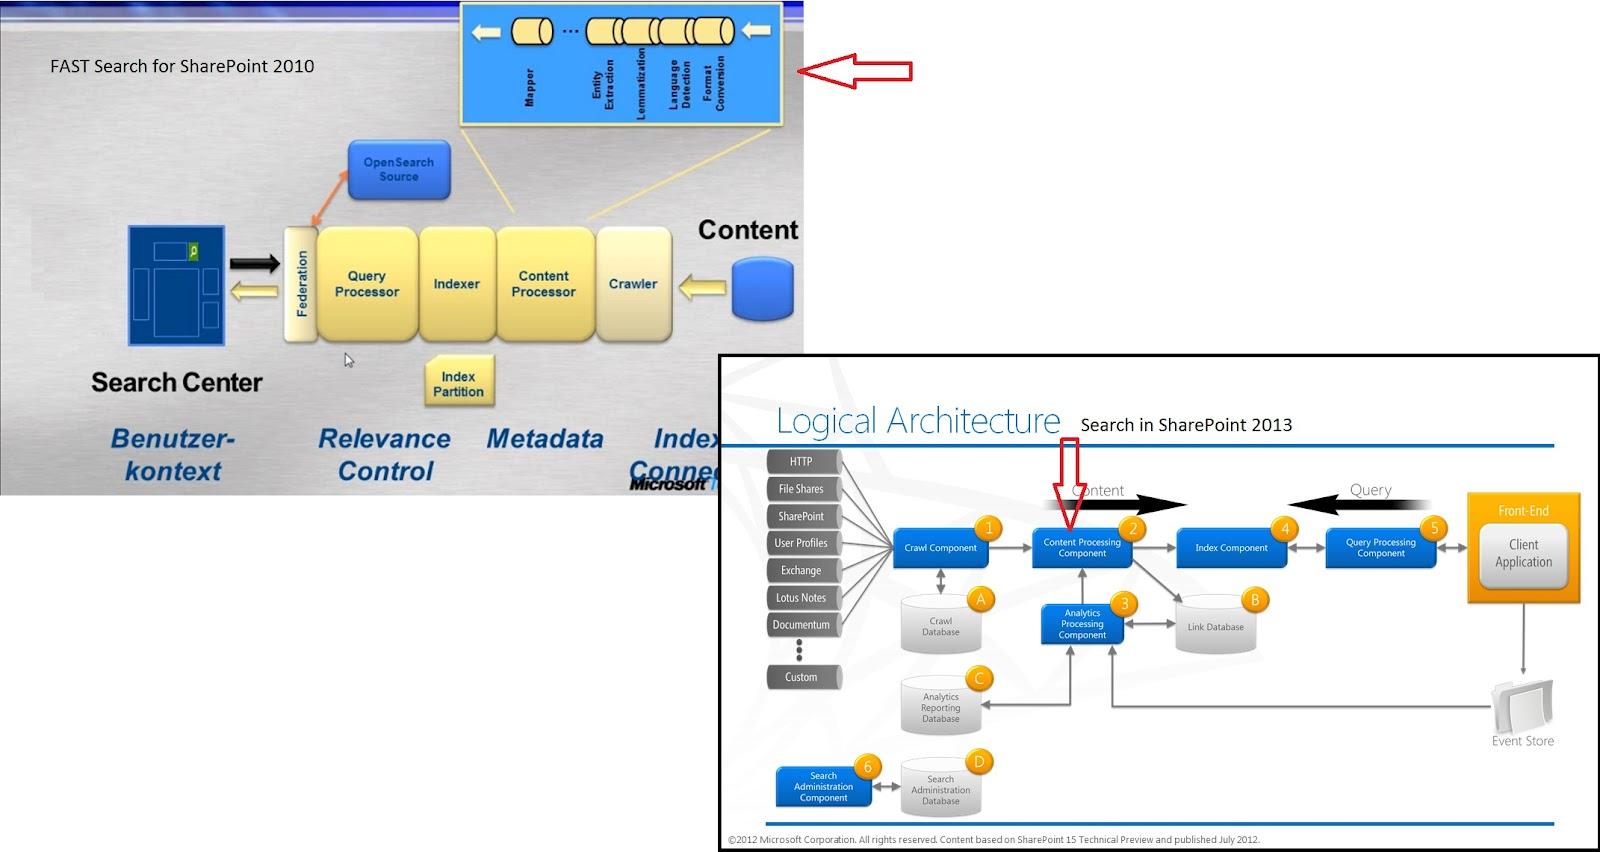 sharepoint talk 2012 microsoft sharepoint tutorial sharepoint 2010 search diagram #44